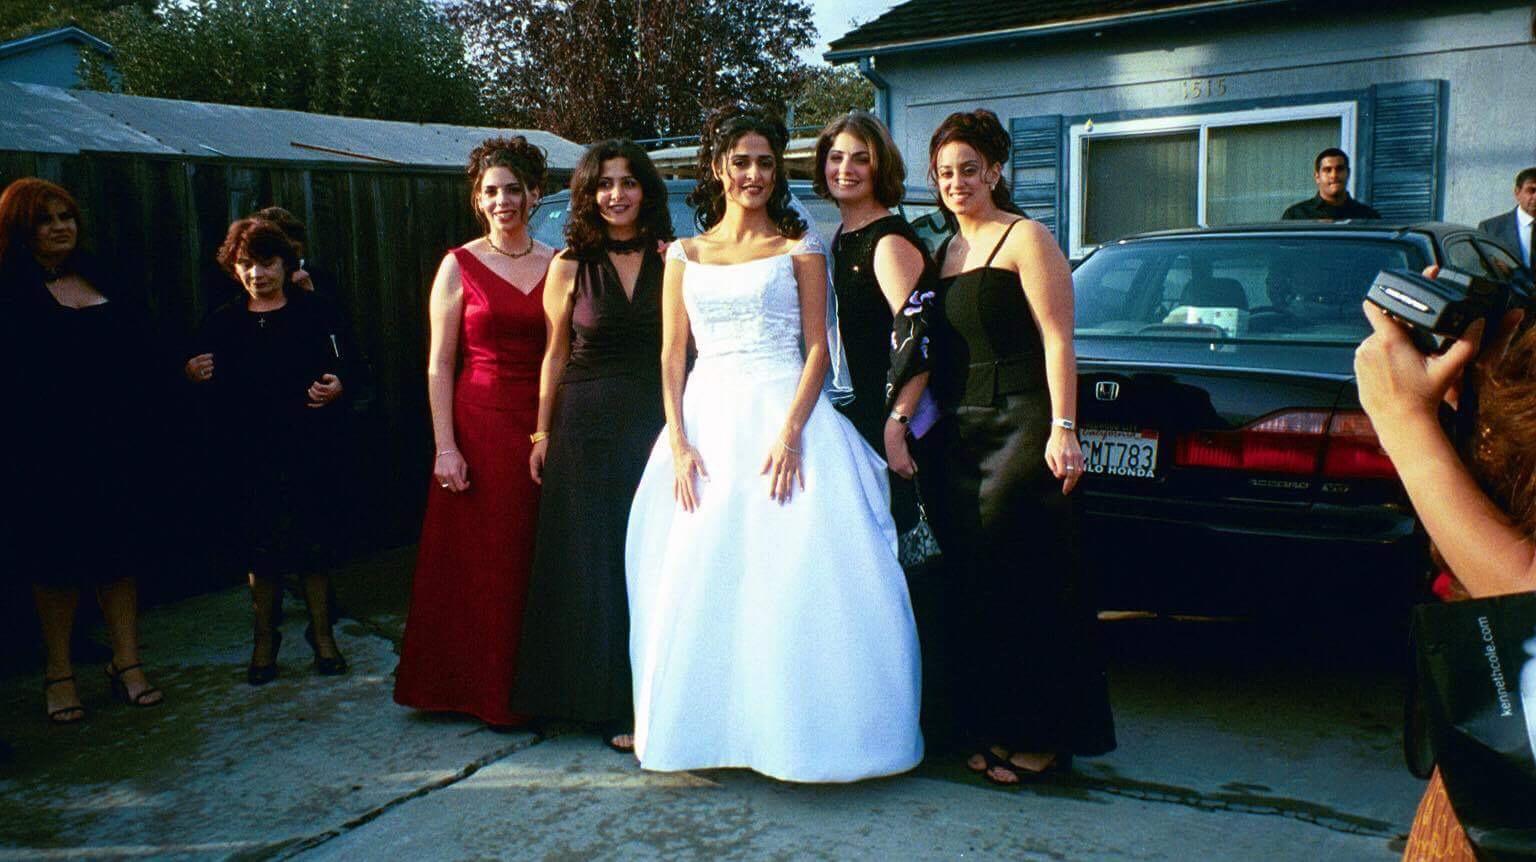 Suzie Afridi MRH 1805 Extra 5